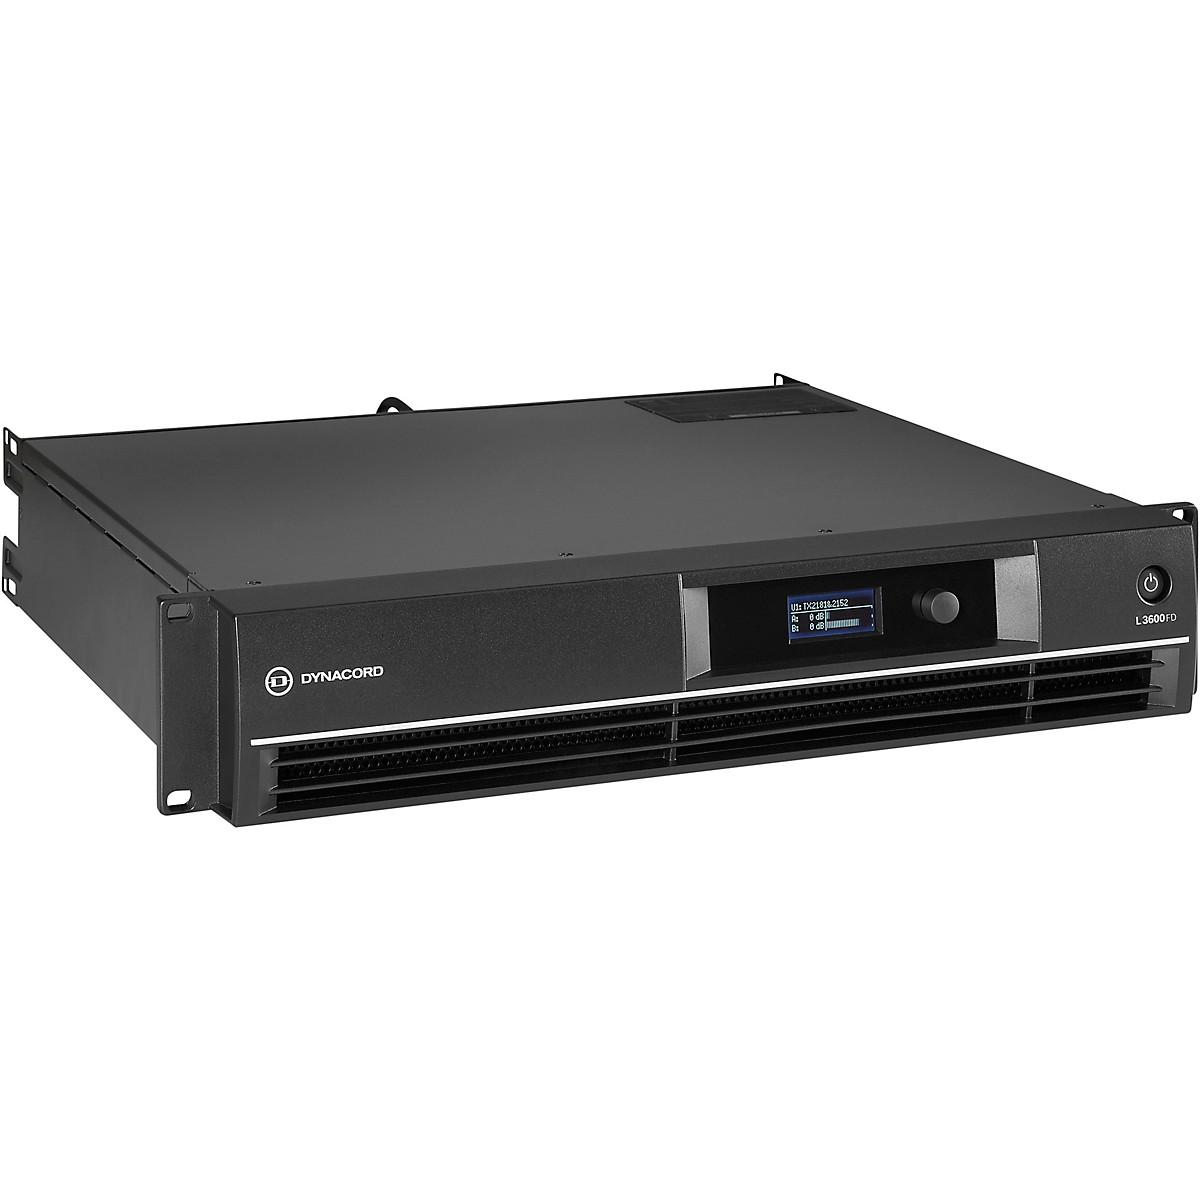 DYNACORD L3600FD DSP Power Amplifier